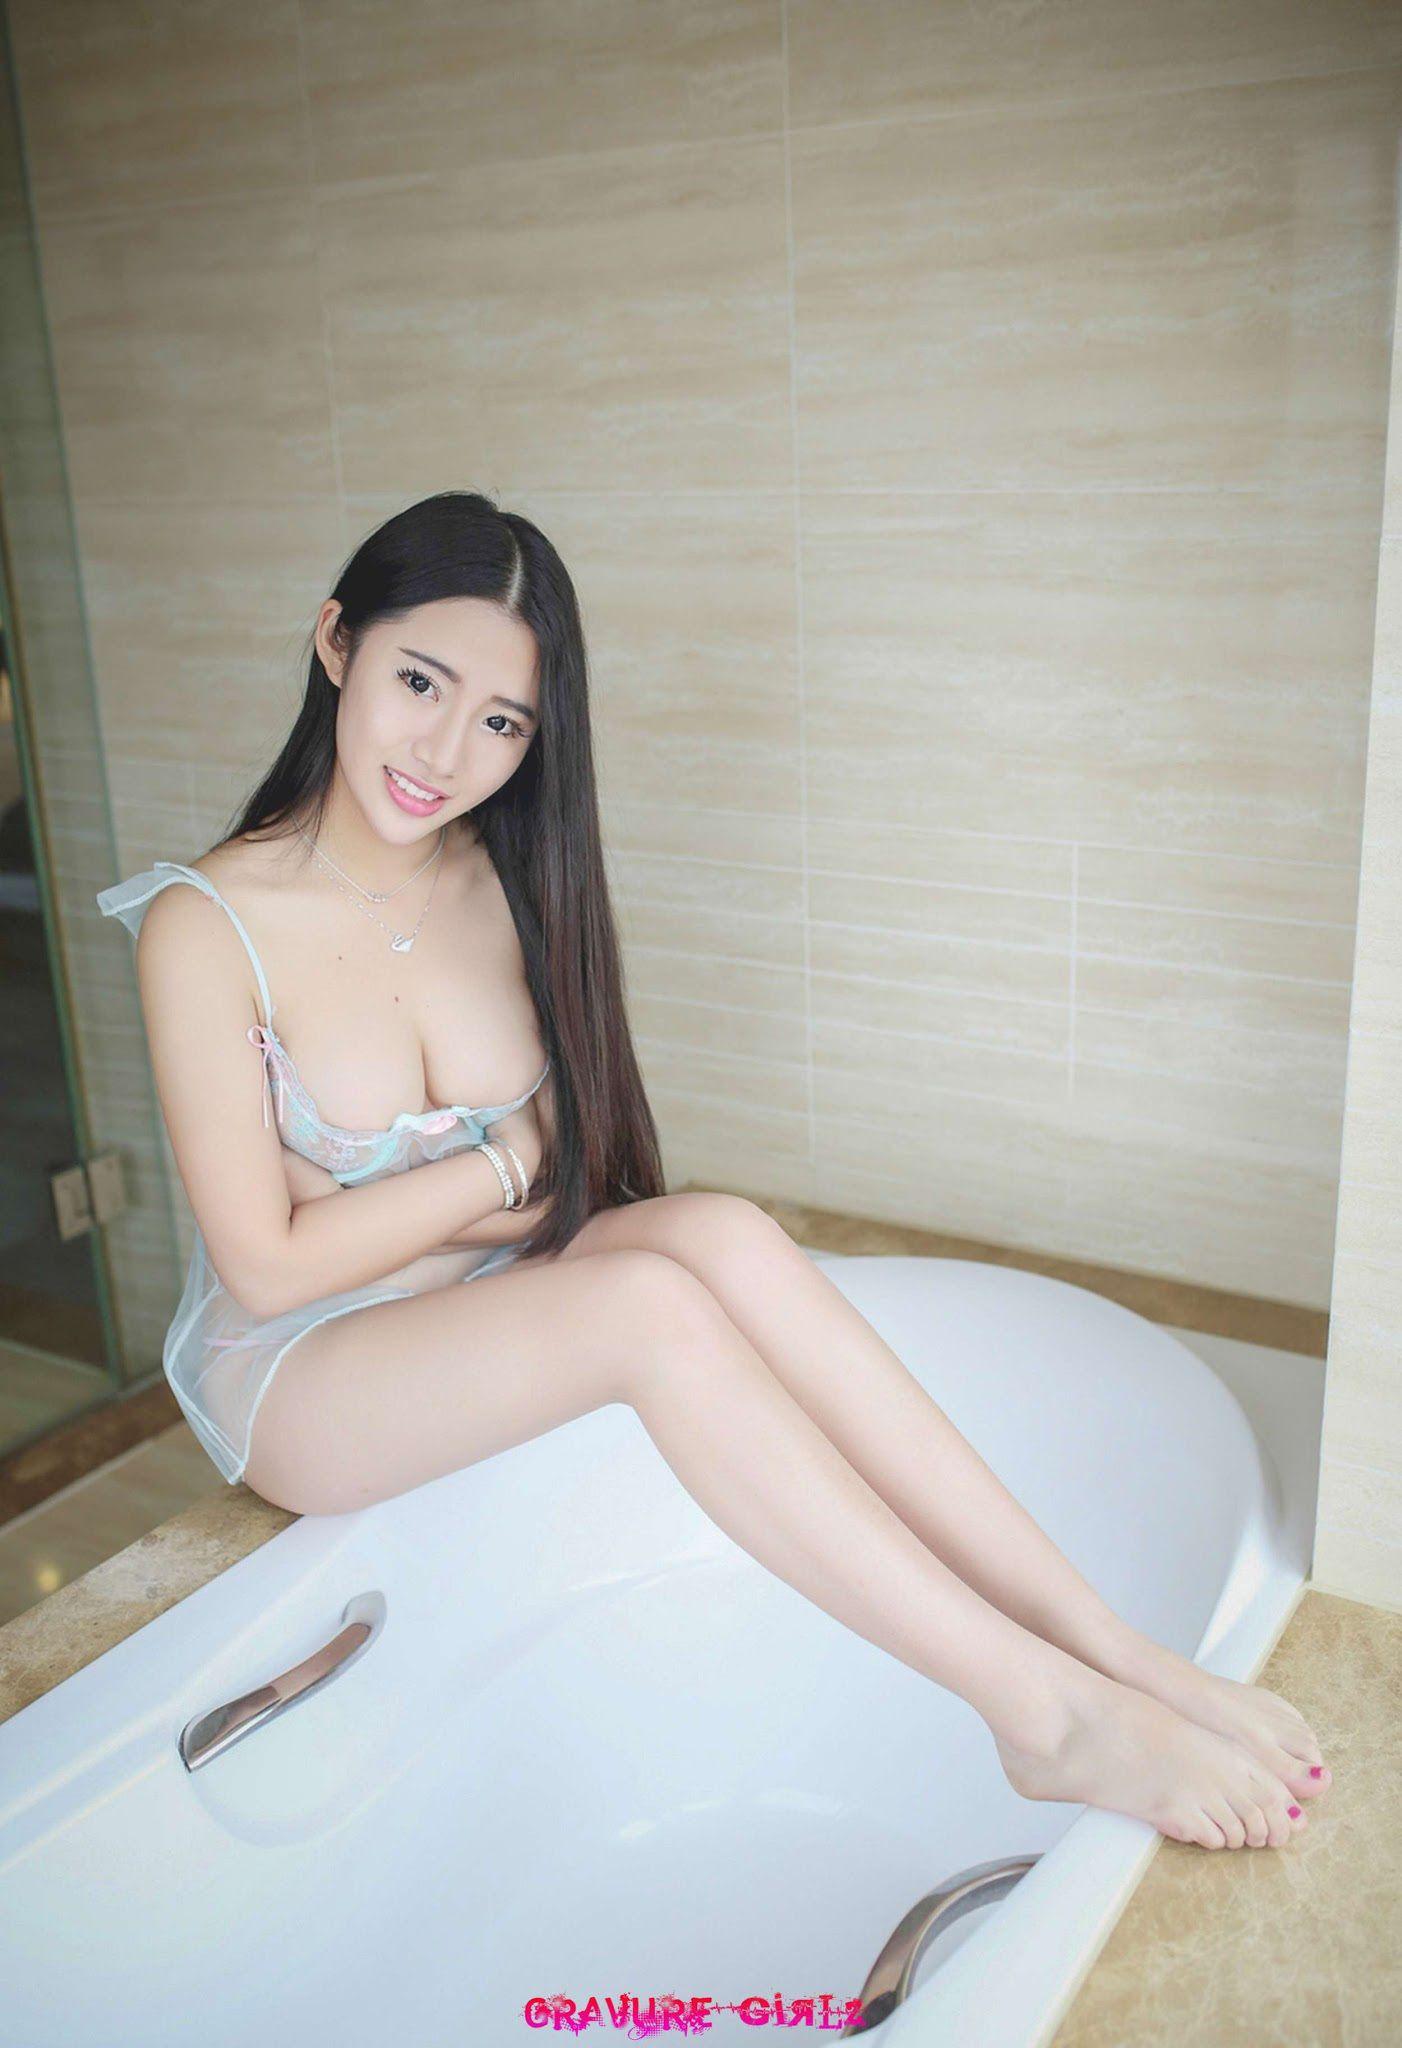 ebcde31b31b888f19a75362b9bb7e83f - Xiuren Hot Gallery Pic